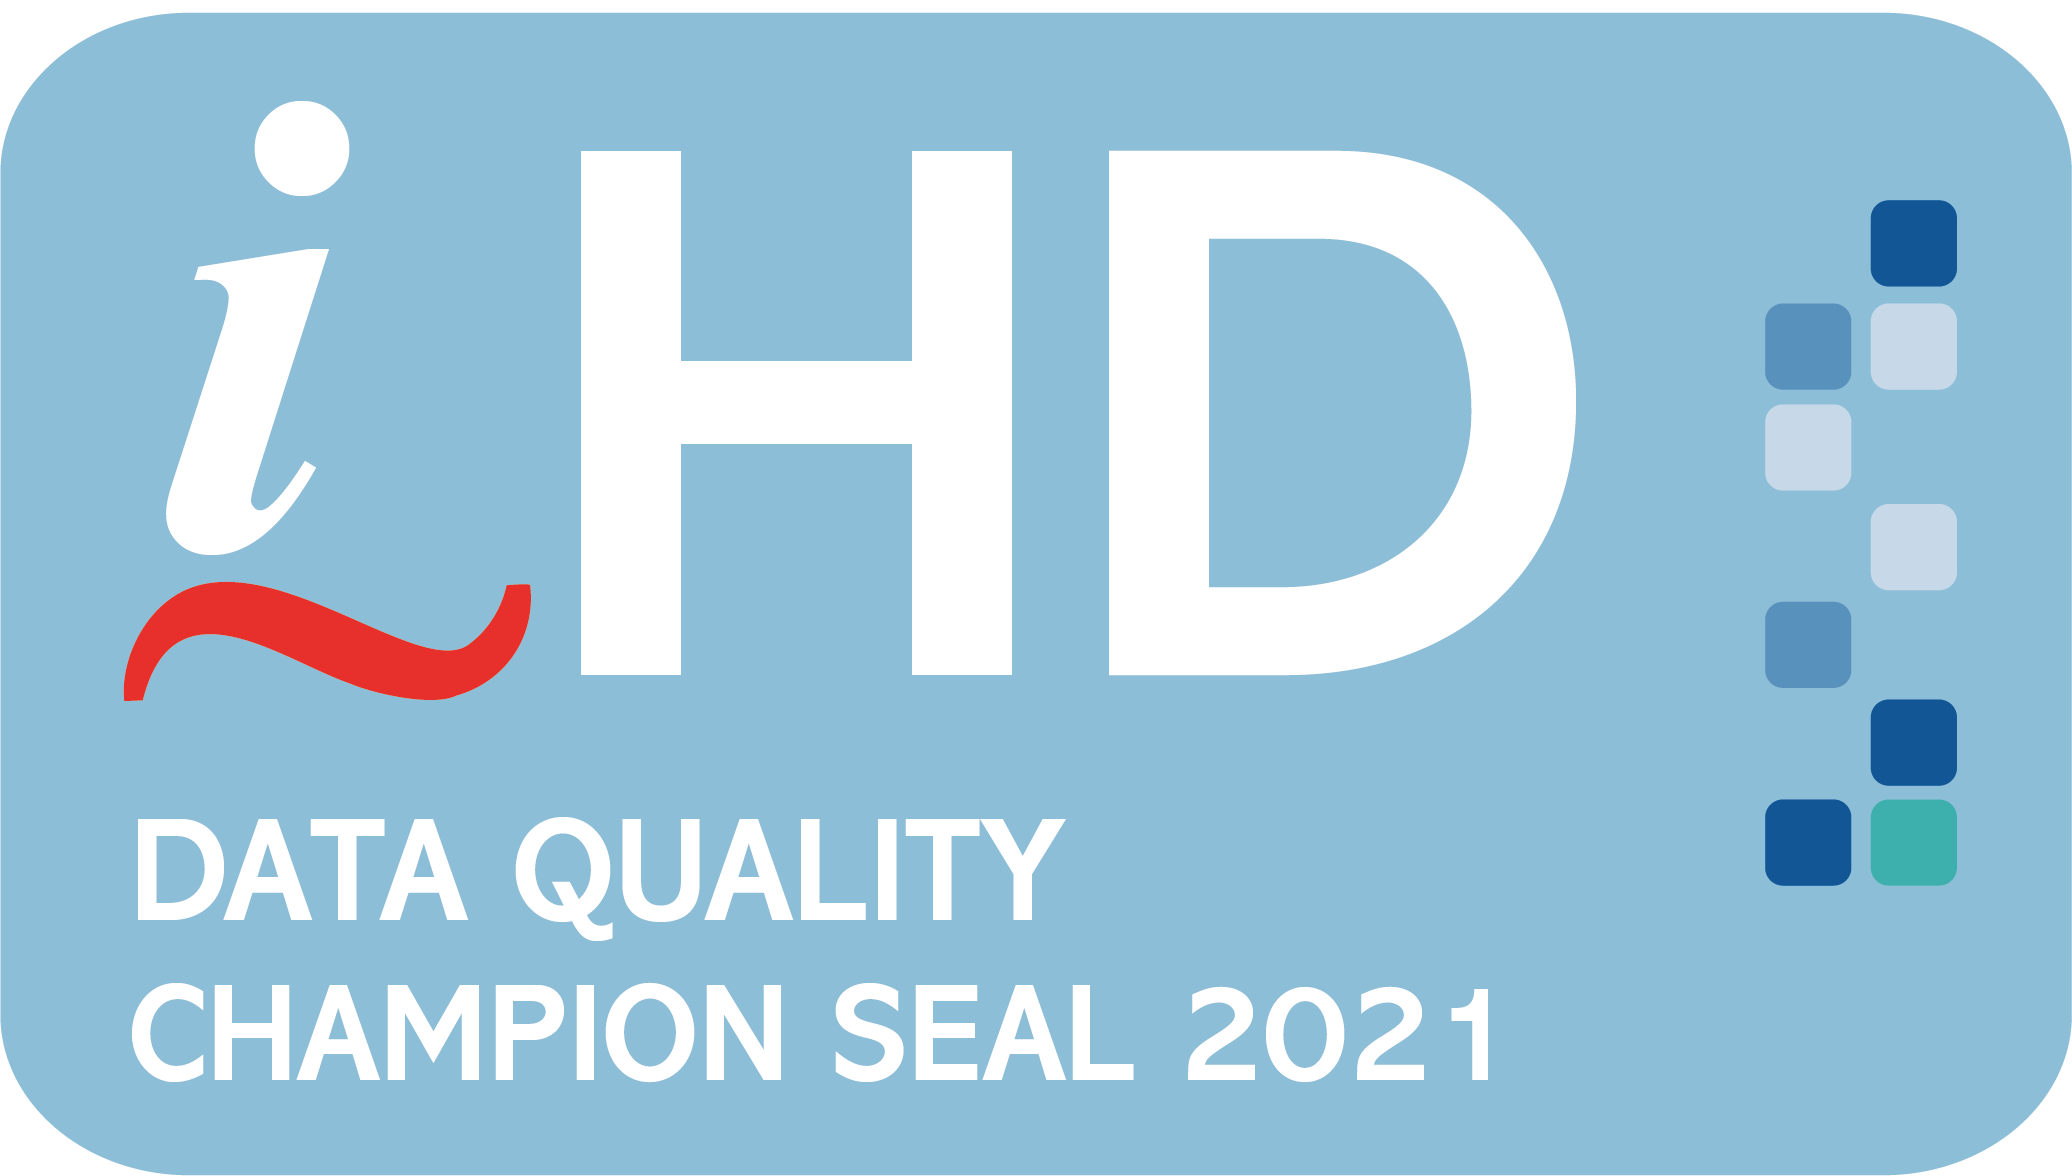 data quality champion seal